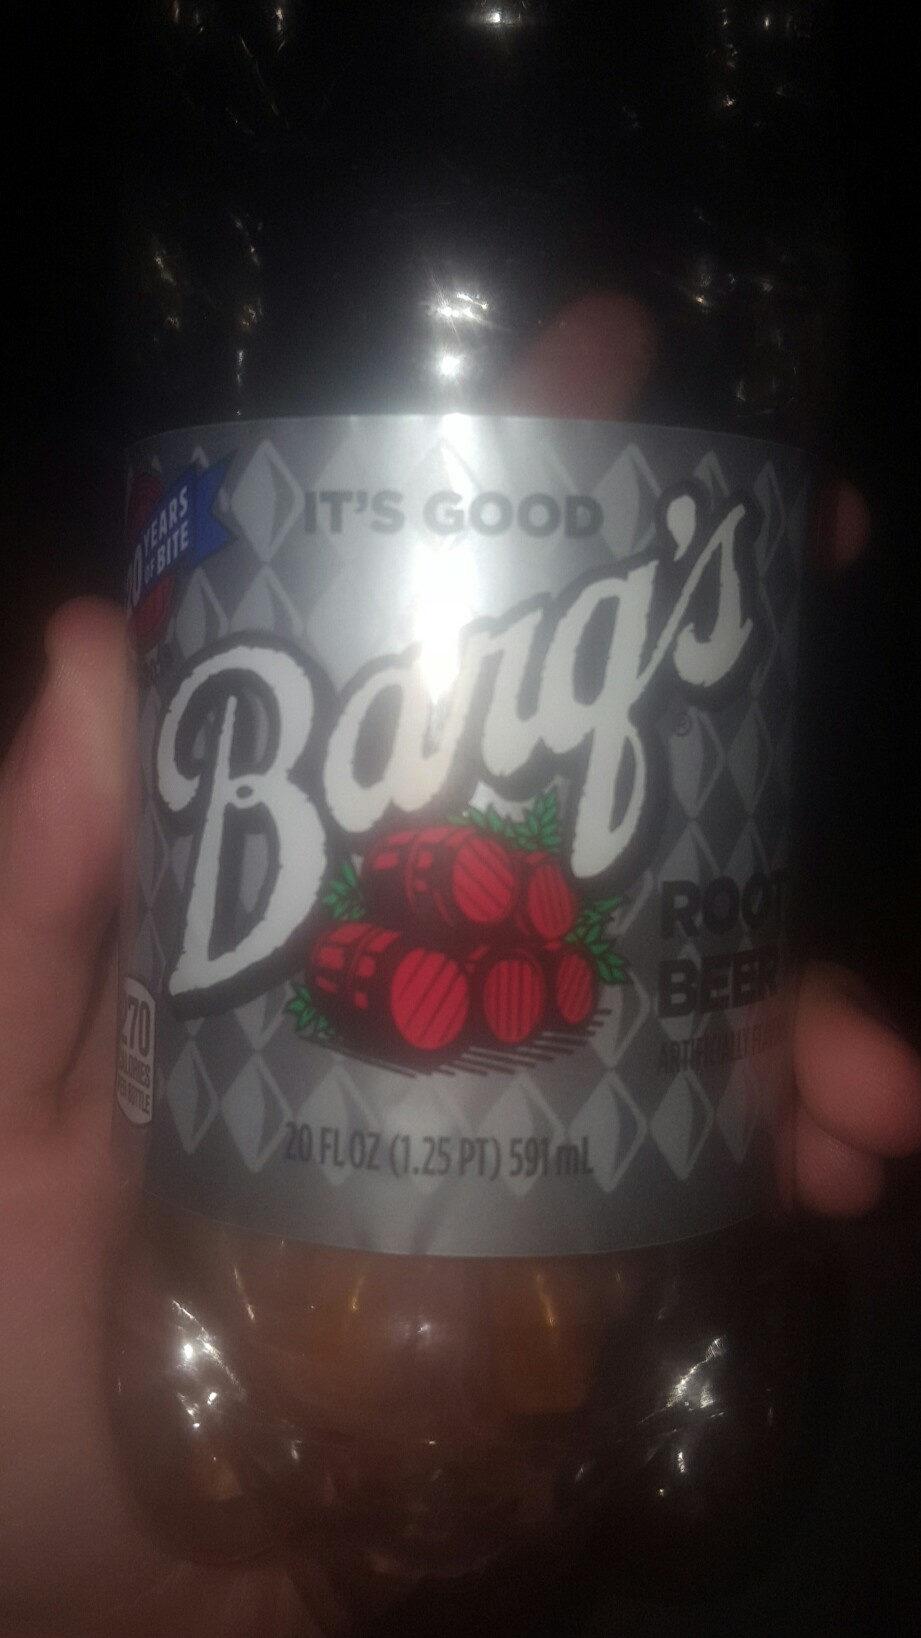 barks root beer - Product - en